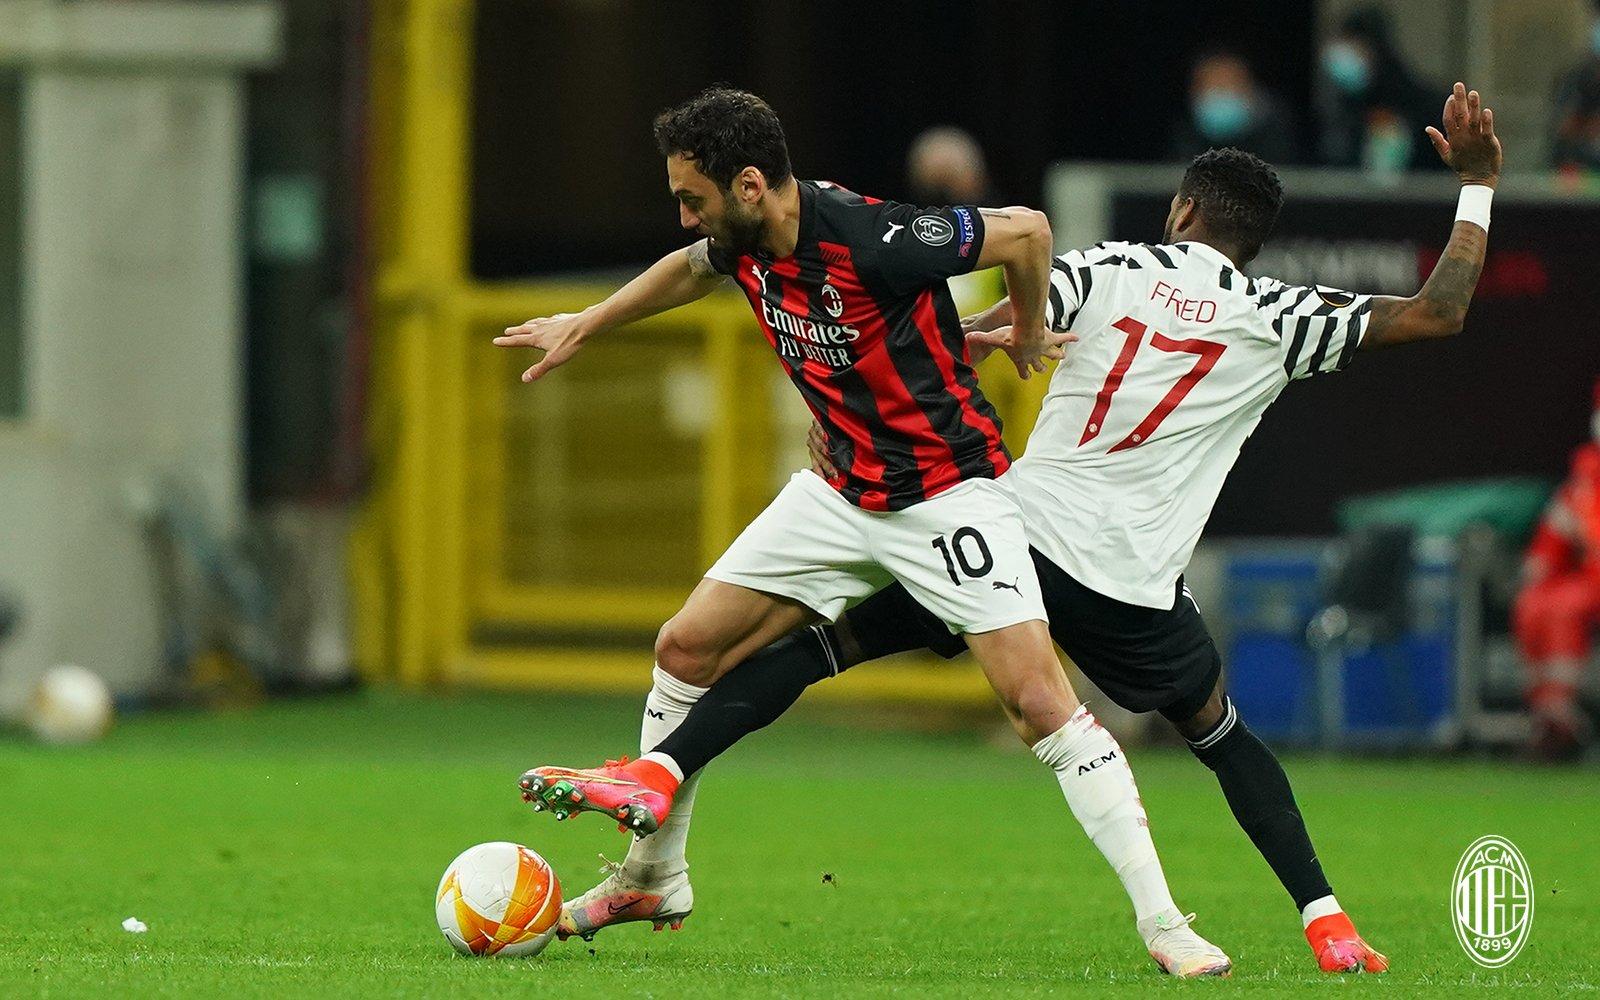 Milan - Manchester United maç özeti izle 0-1! Pogba attı, Manchester United turladı